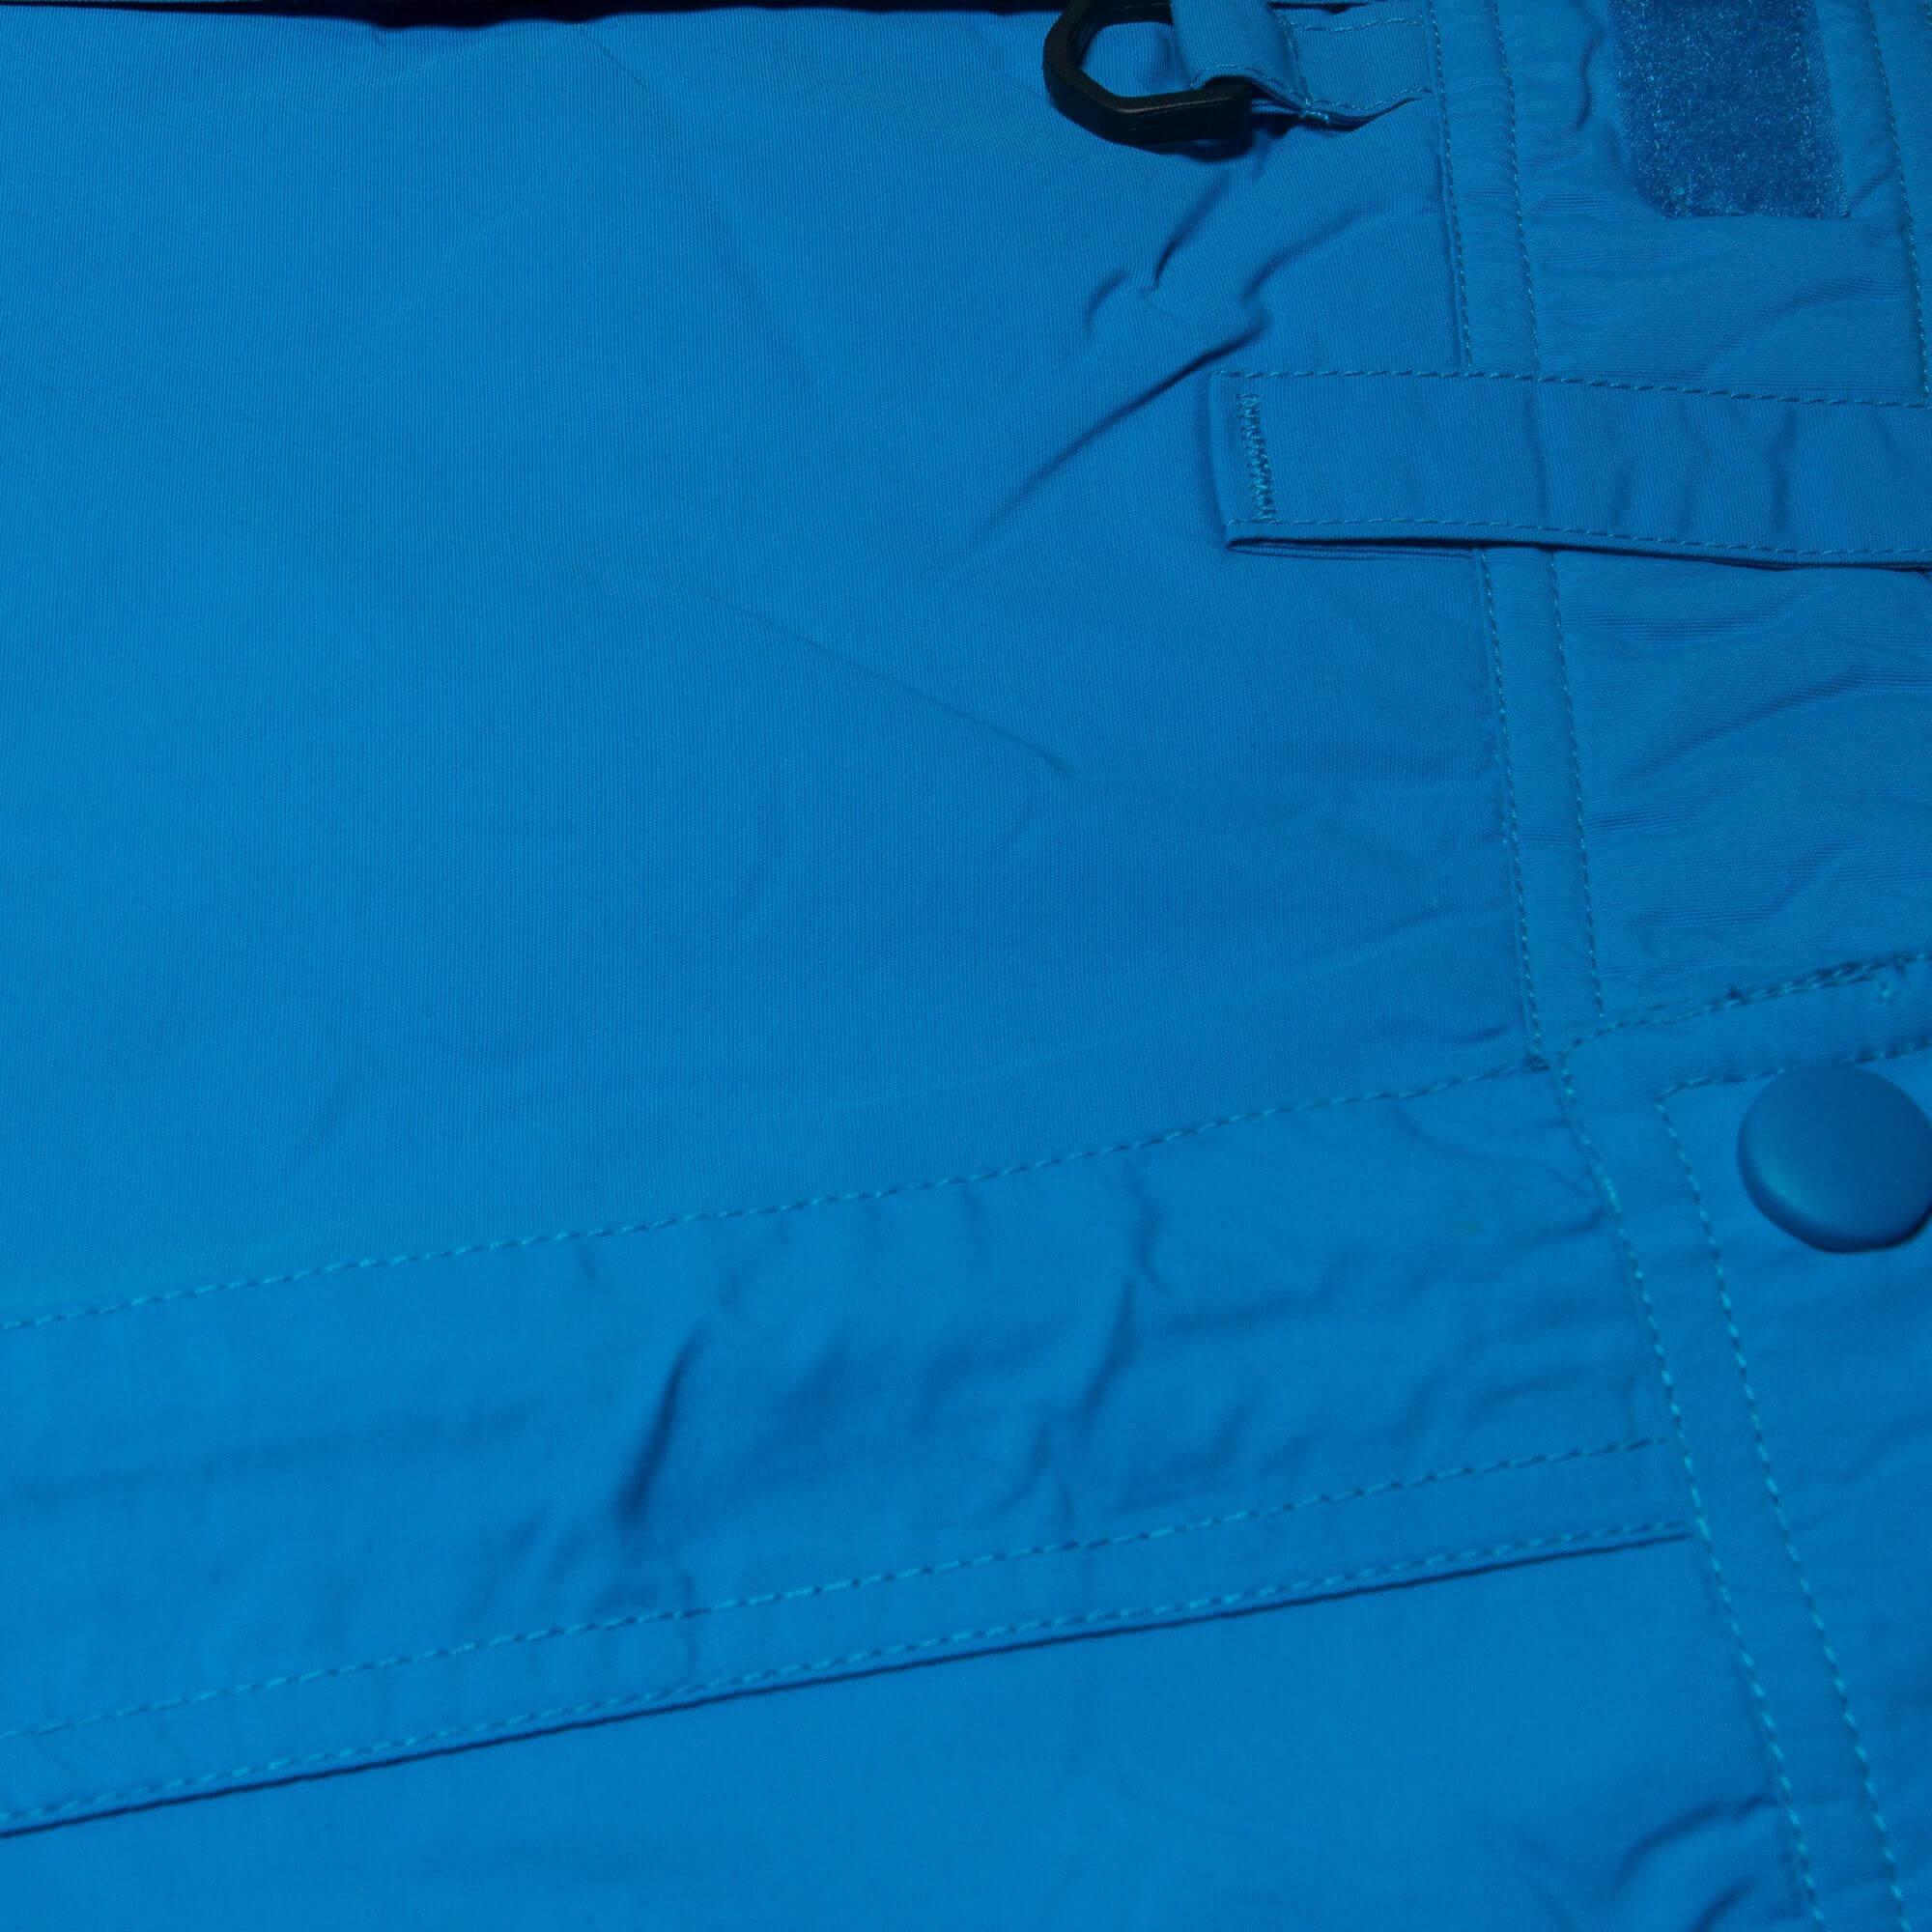 mărci recunoscute 50% reducere o noua sosire Pantaloni ski barbati Crivit Sports, impermeabili, rezistenti la vant  puternic, Albastru, Marime 52 - eMAG.ro